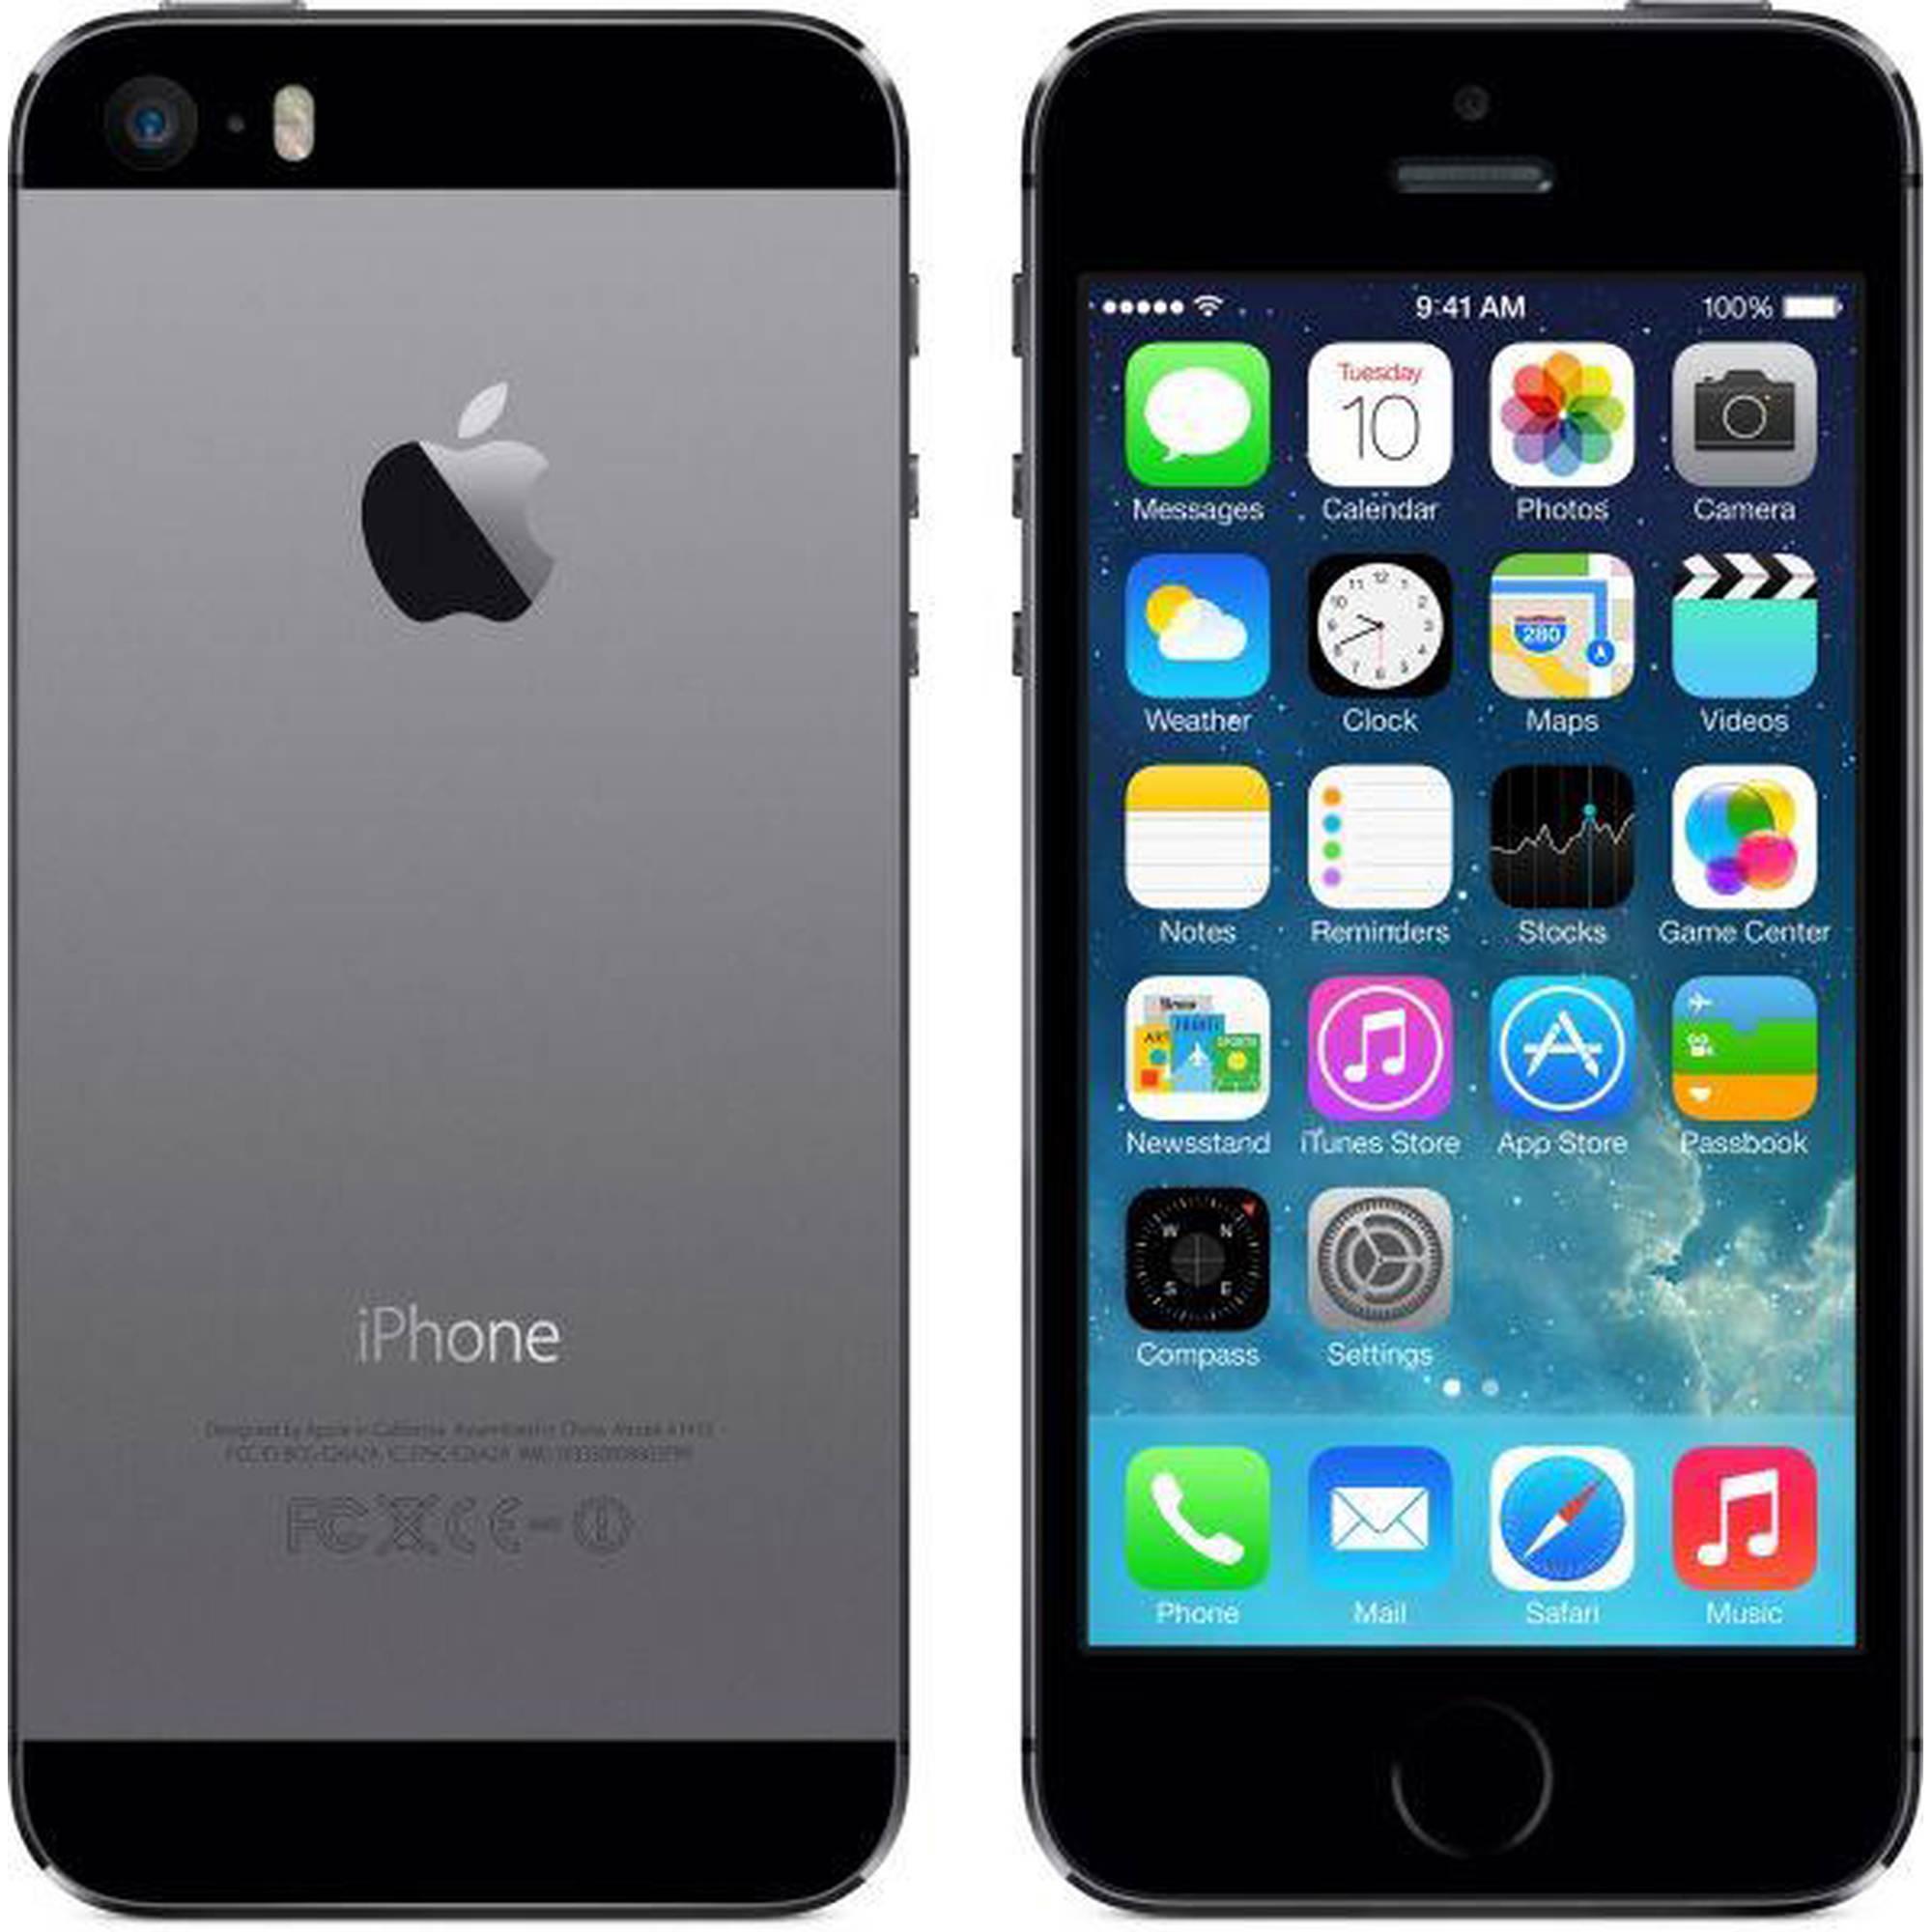 iphone 5s black images